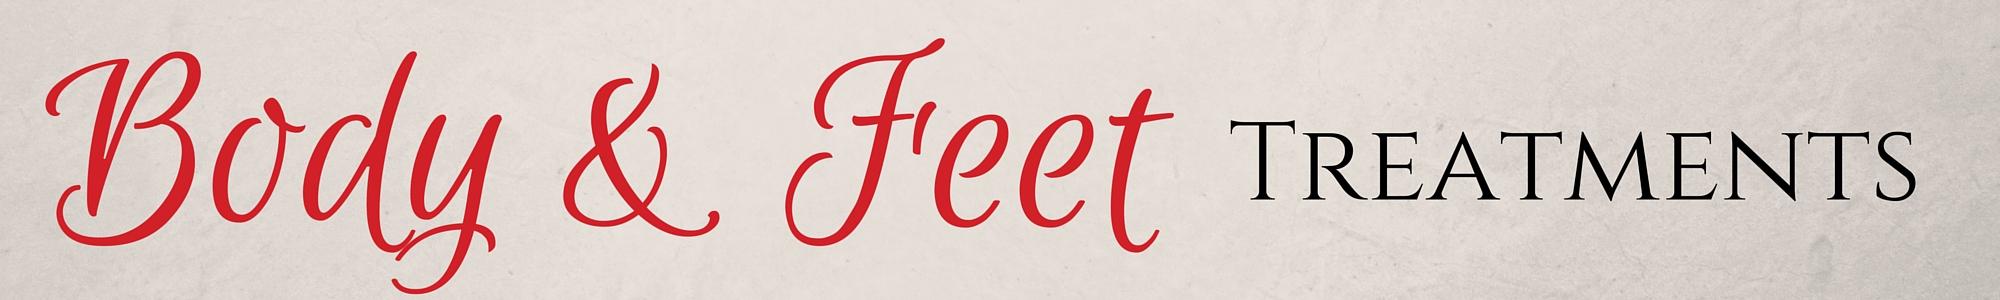 body treatments, foot treatments